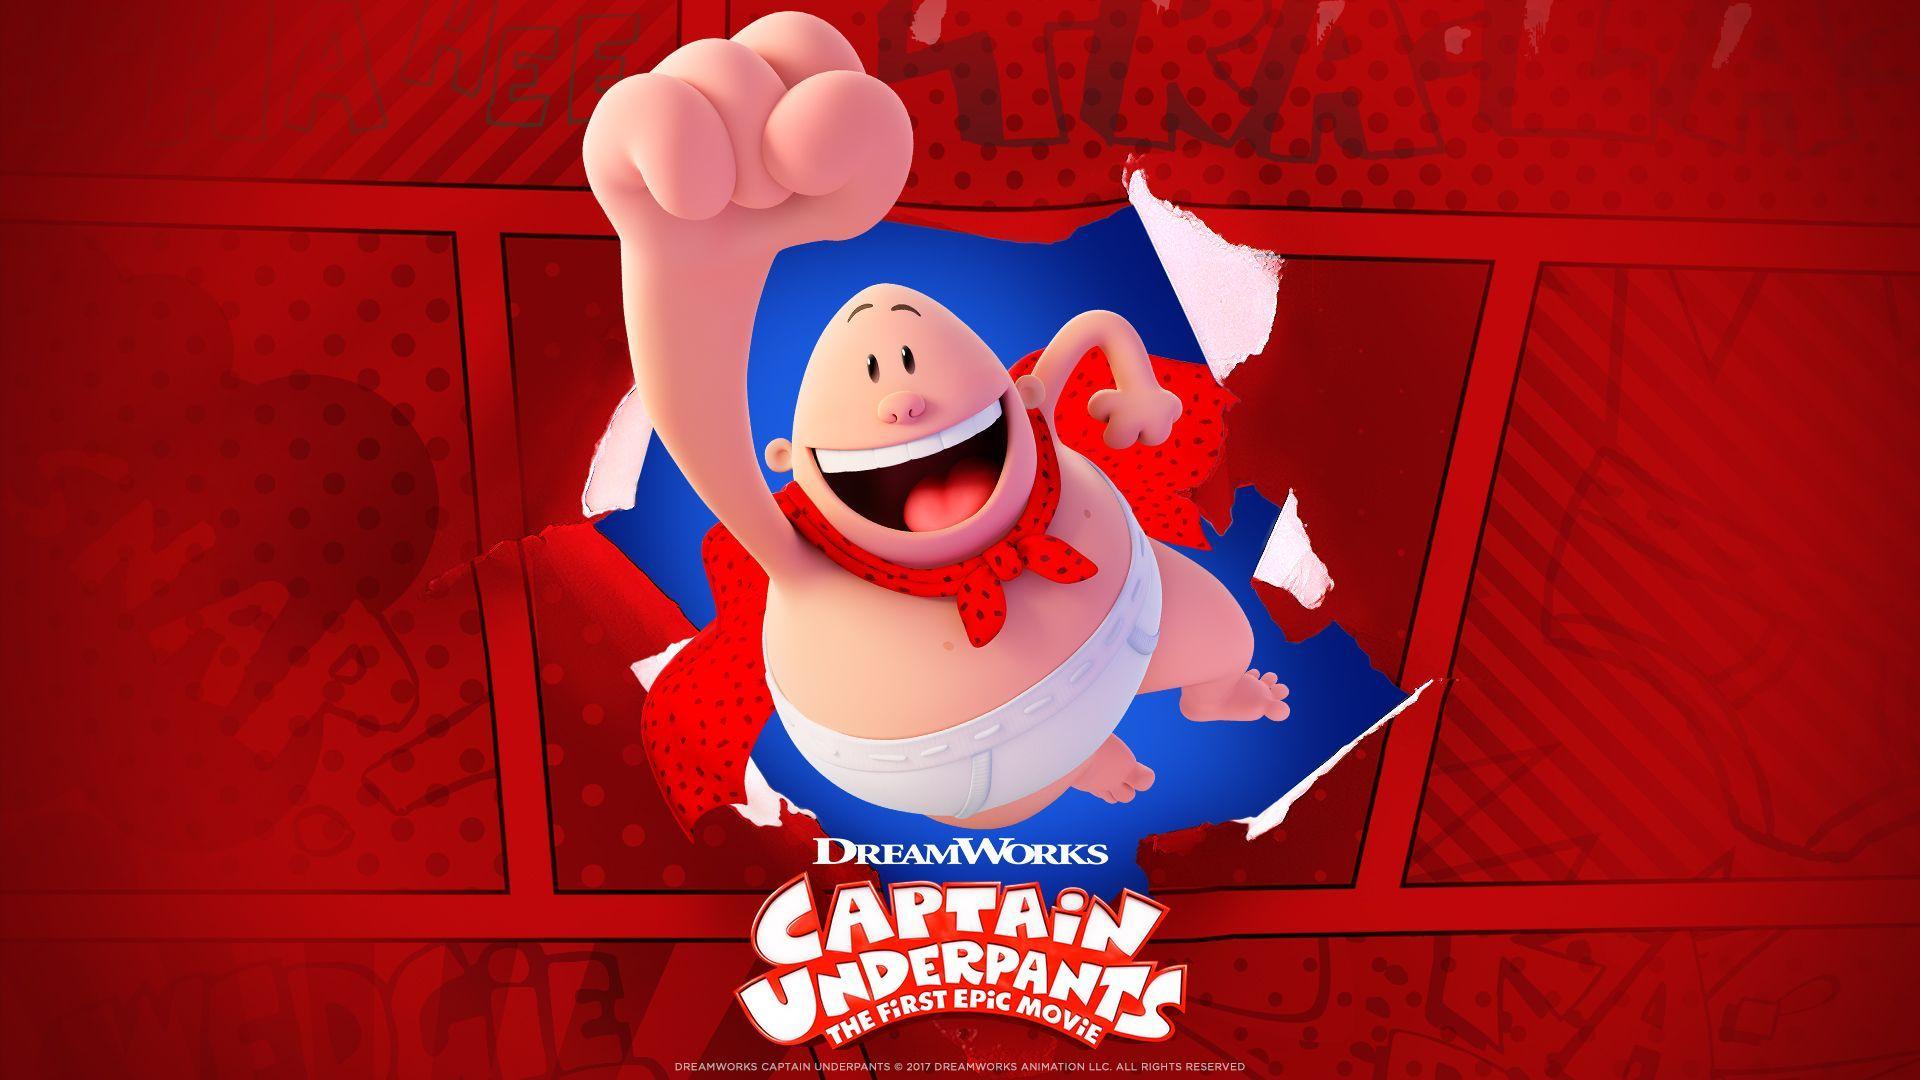 captain underpants movie download mp4